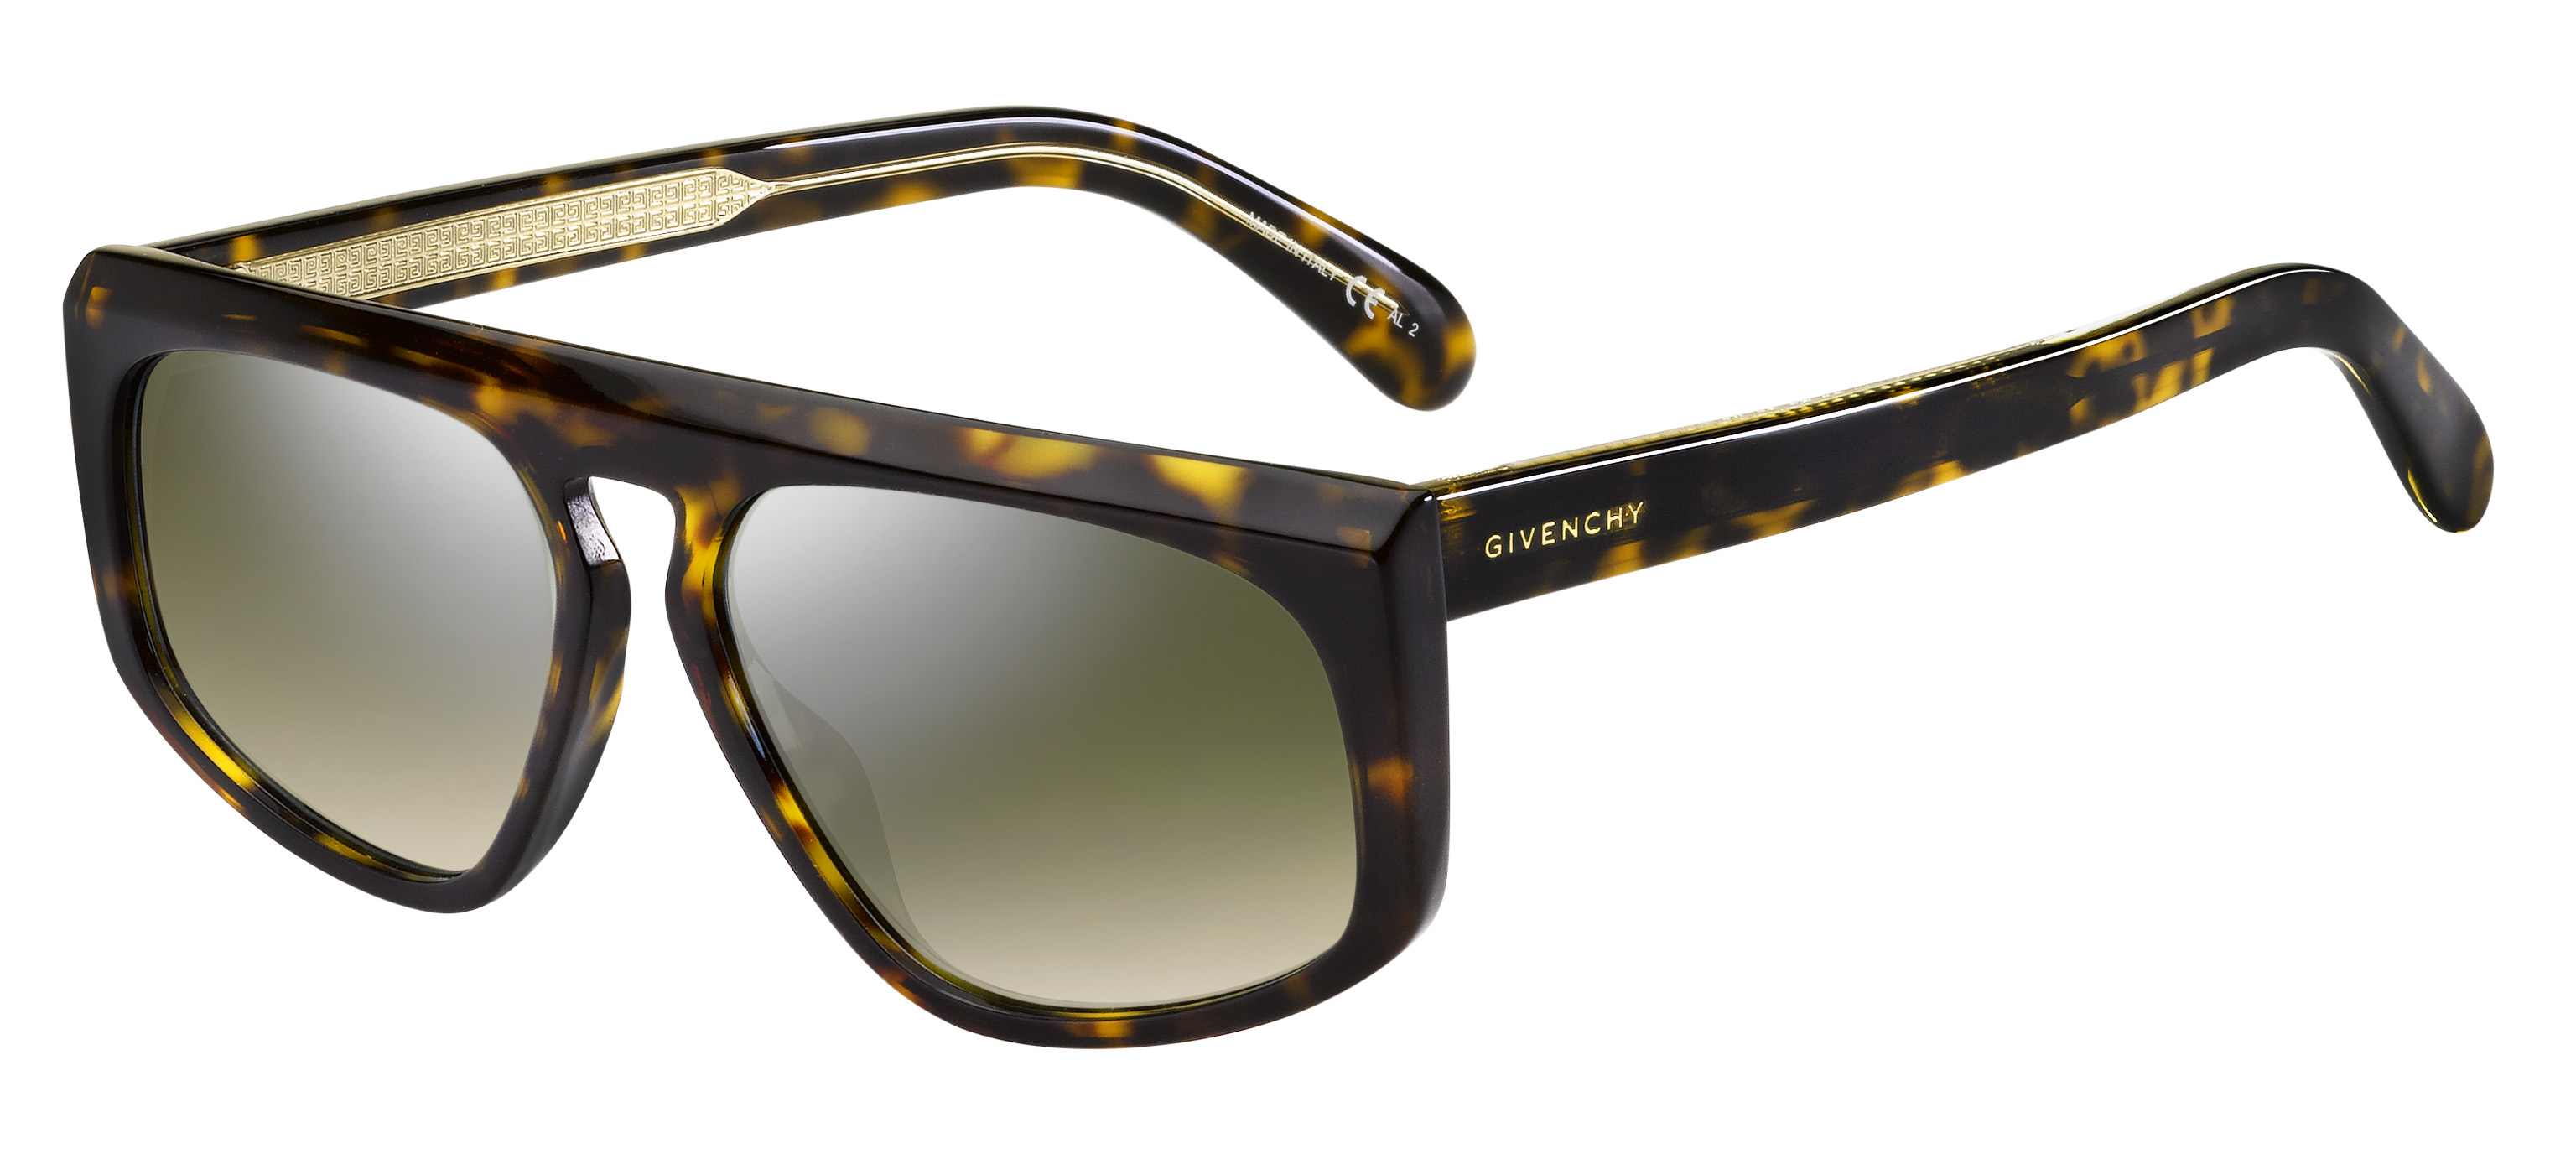 Givenchy GV SQUARED GV 7125/S